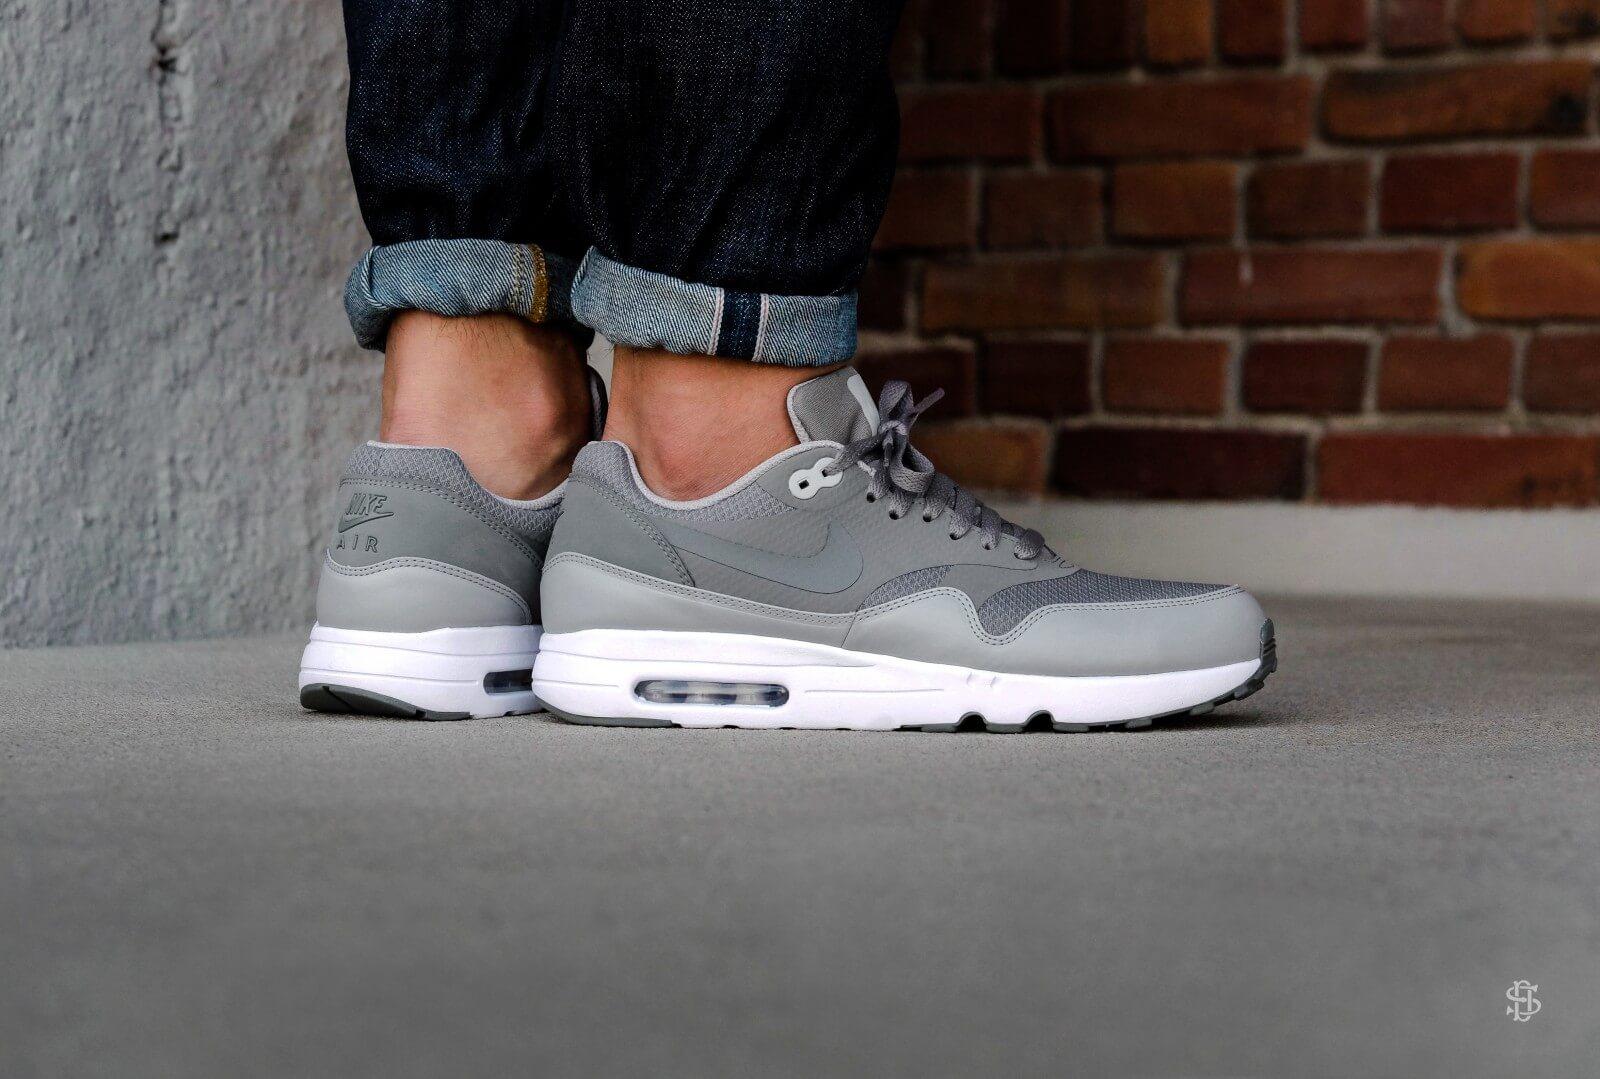 Nike Air Max 1 Ultra 2.0 Essential Men's Shoe | Schoenen